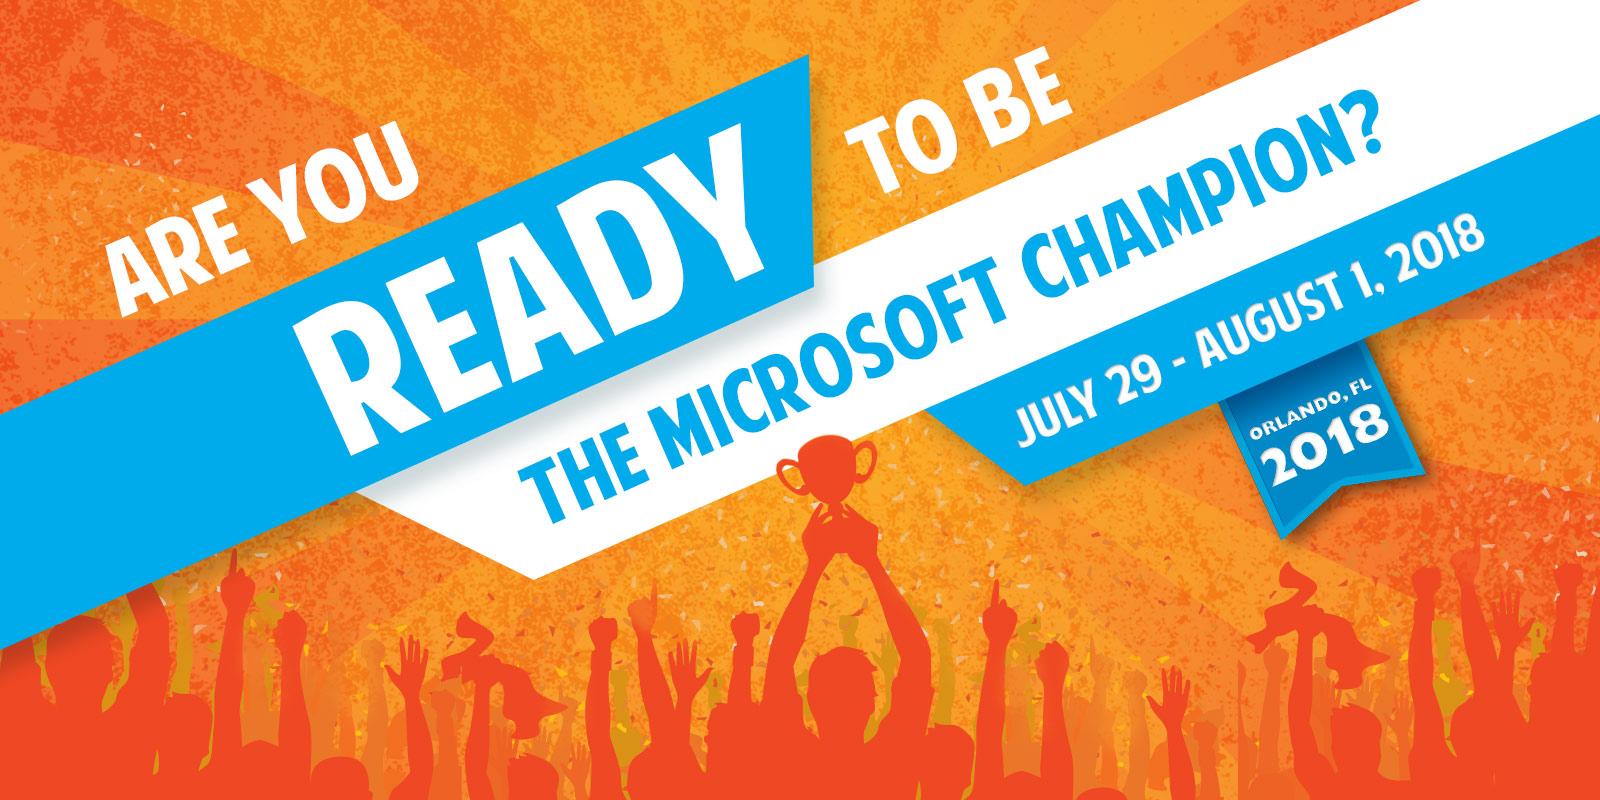 Microsoft Office Specialist World Championships 2018